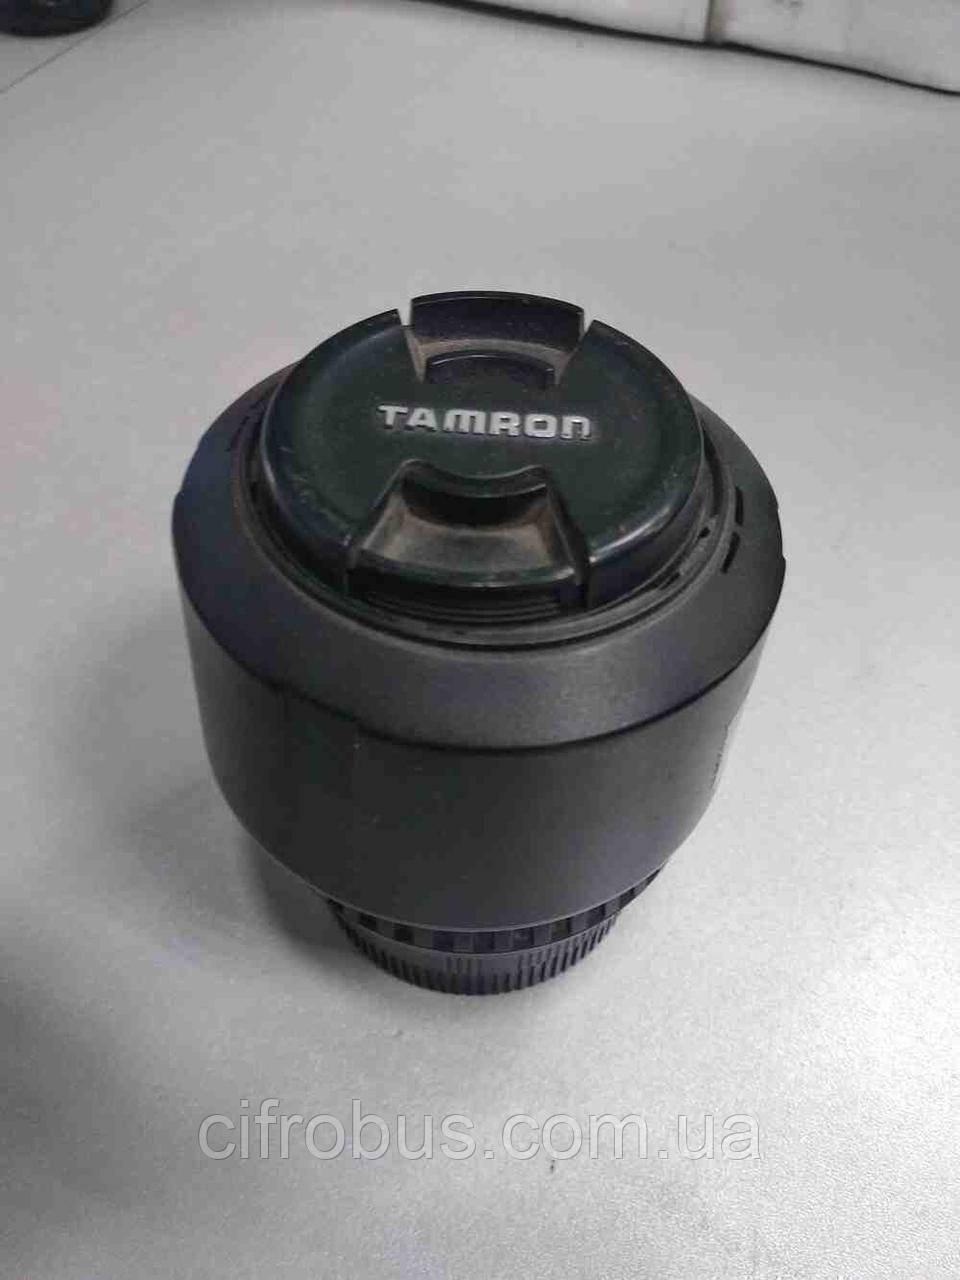 Б/У Tamron AF 55-200mm f/4-5,6 Di II LD MACRO (A15) Canon EF-S